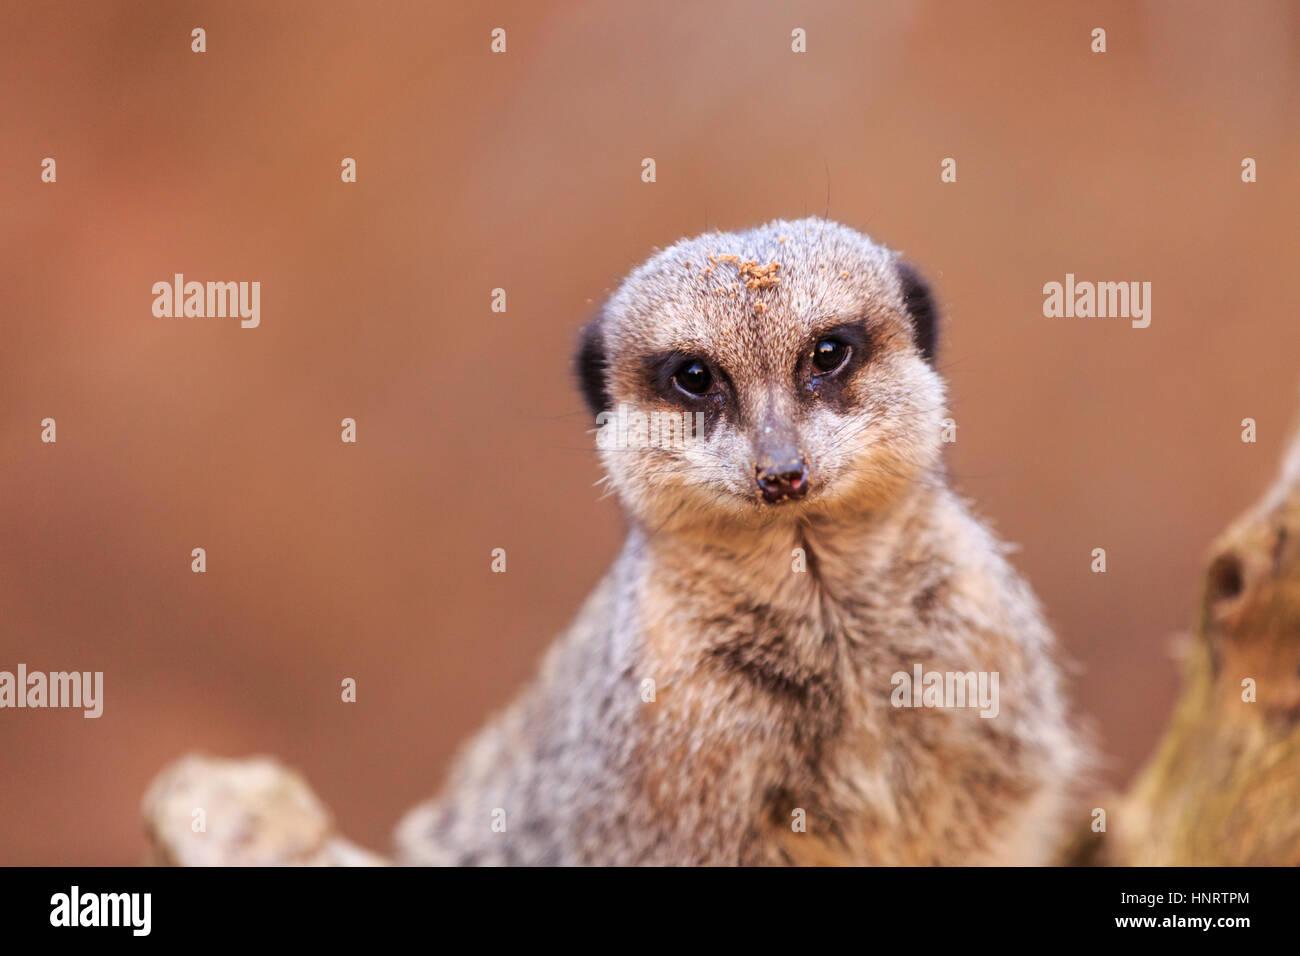 Close up ofcute meerkat - Stock Image